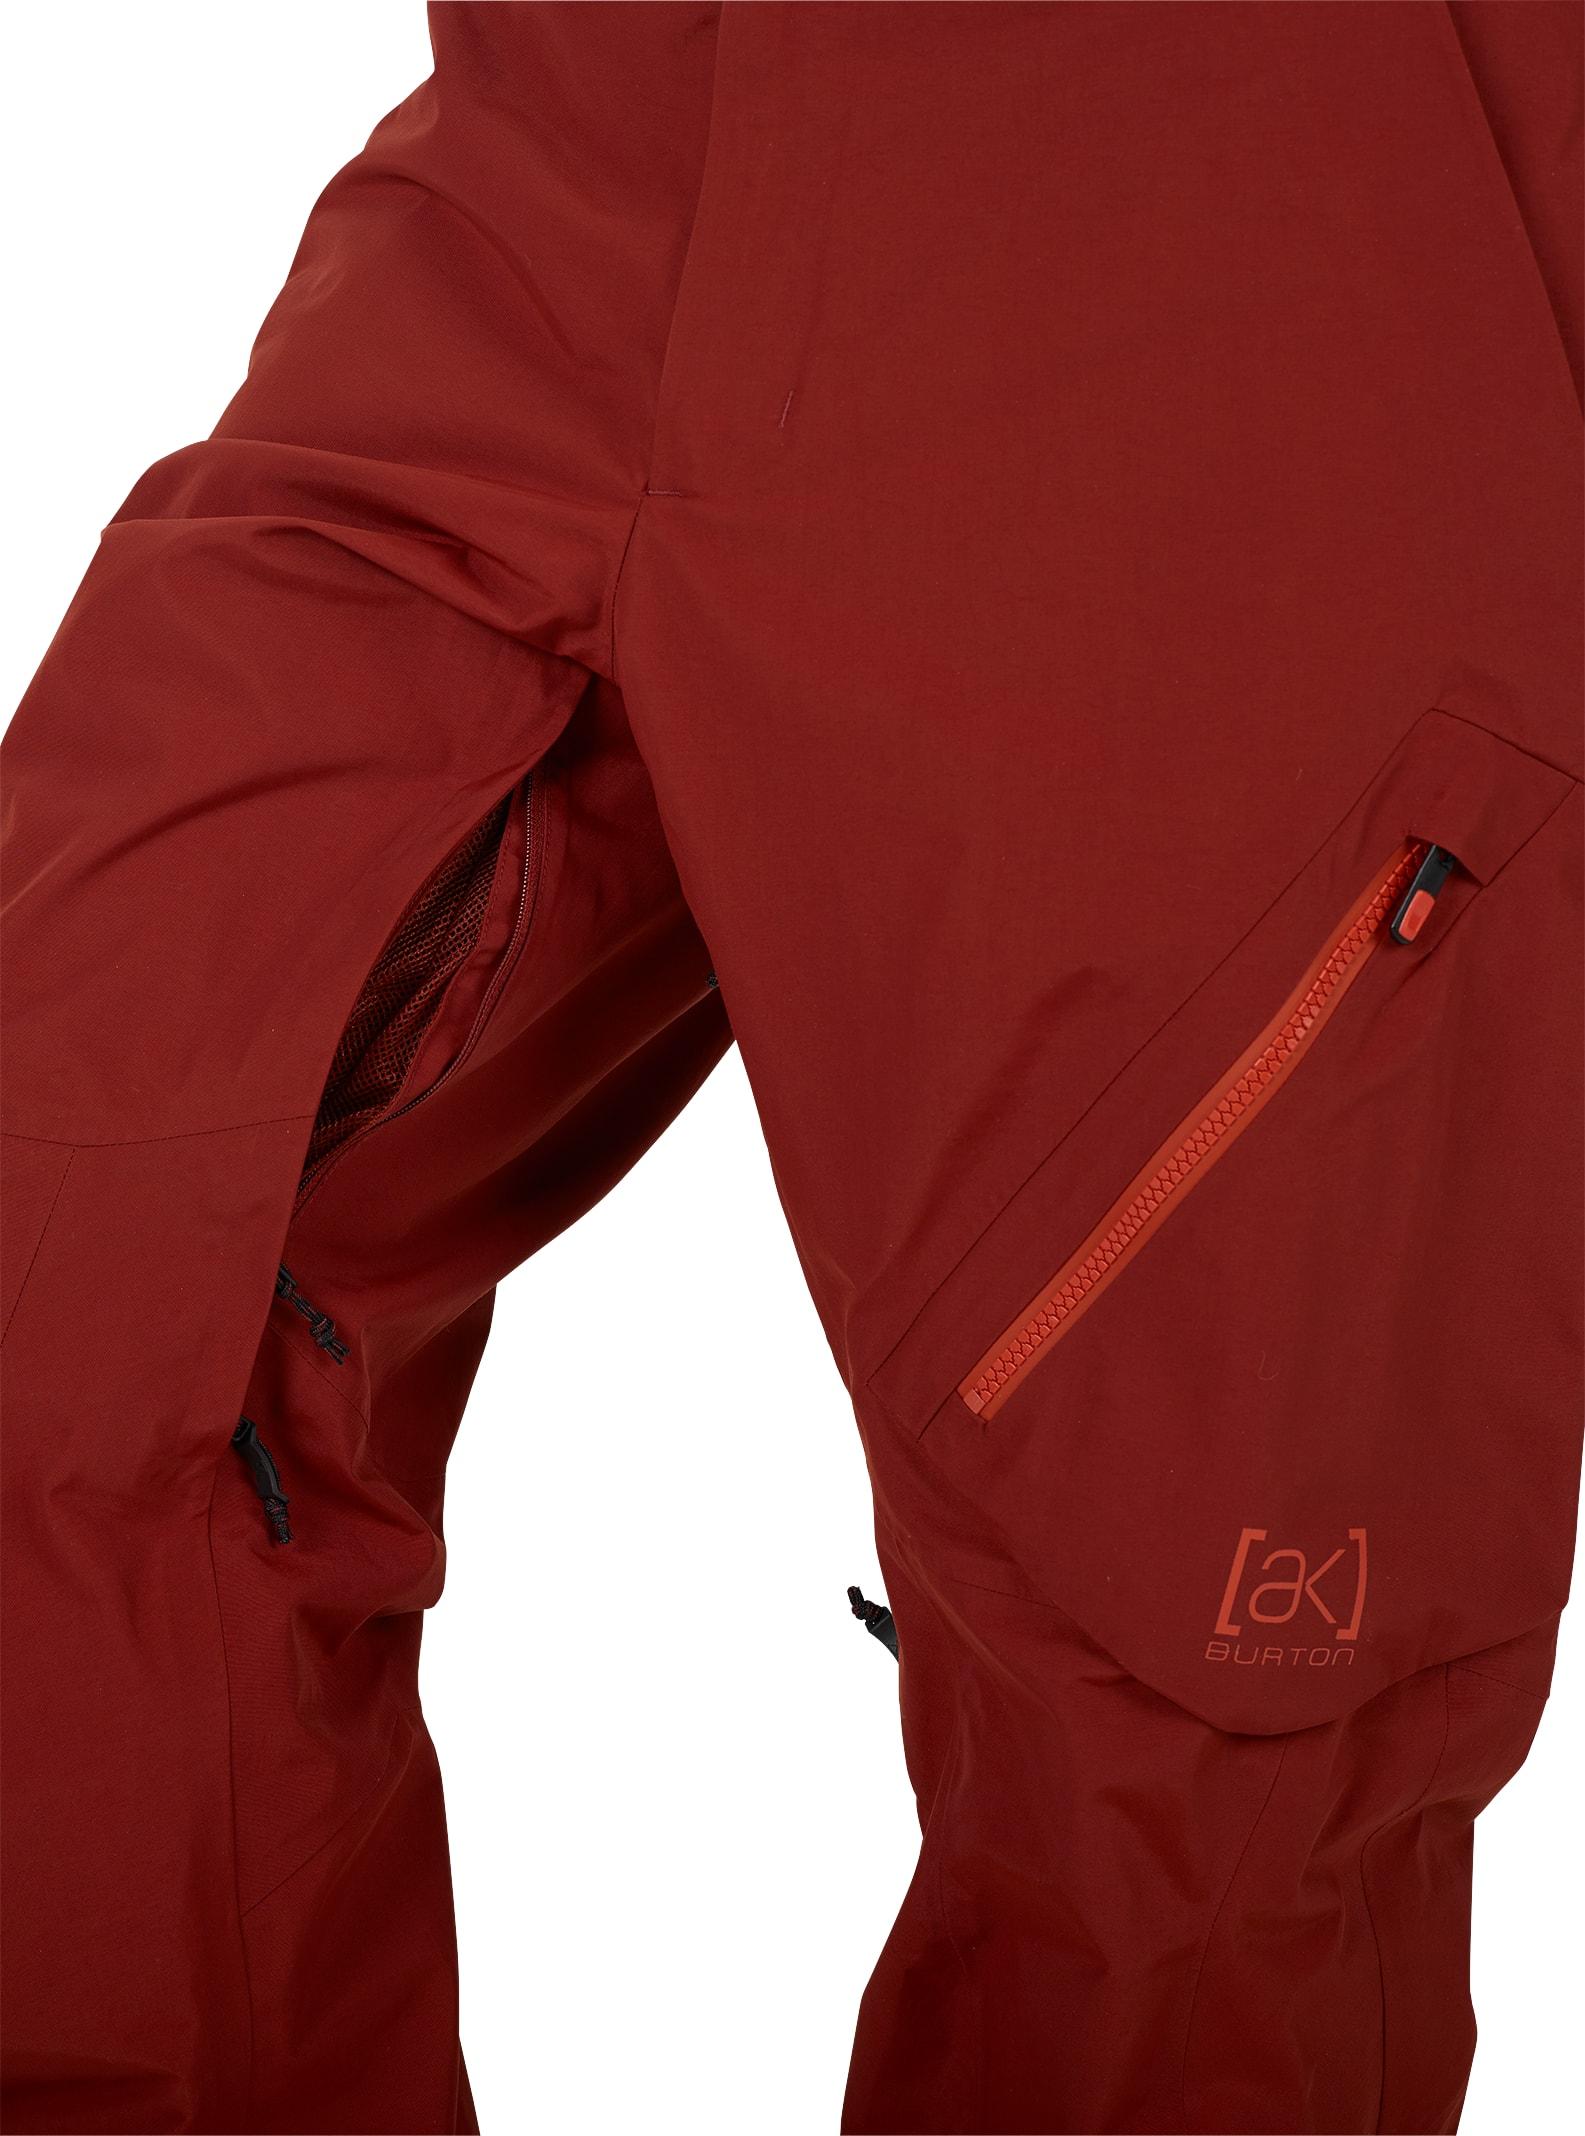 Burton AK Cyclic Pant GoreTex Herren Snowboardhose Skihose Funktionshose GTX NEU